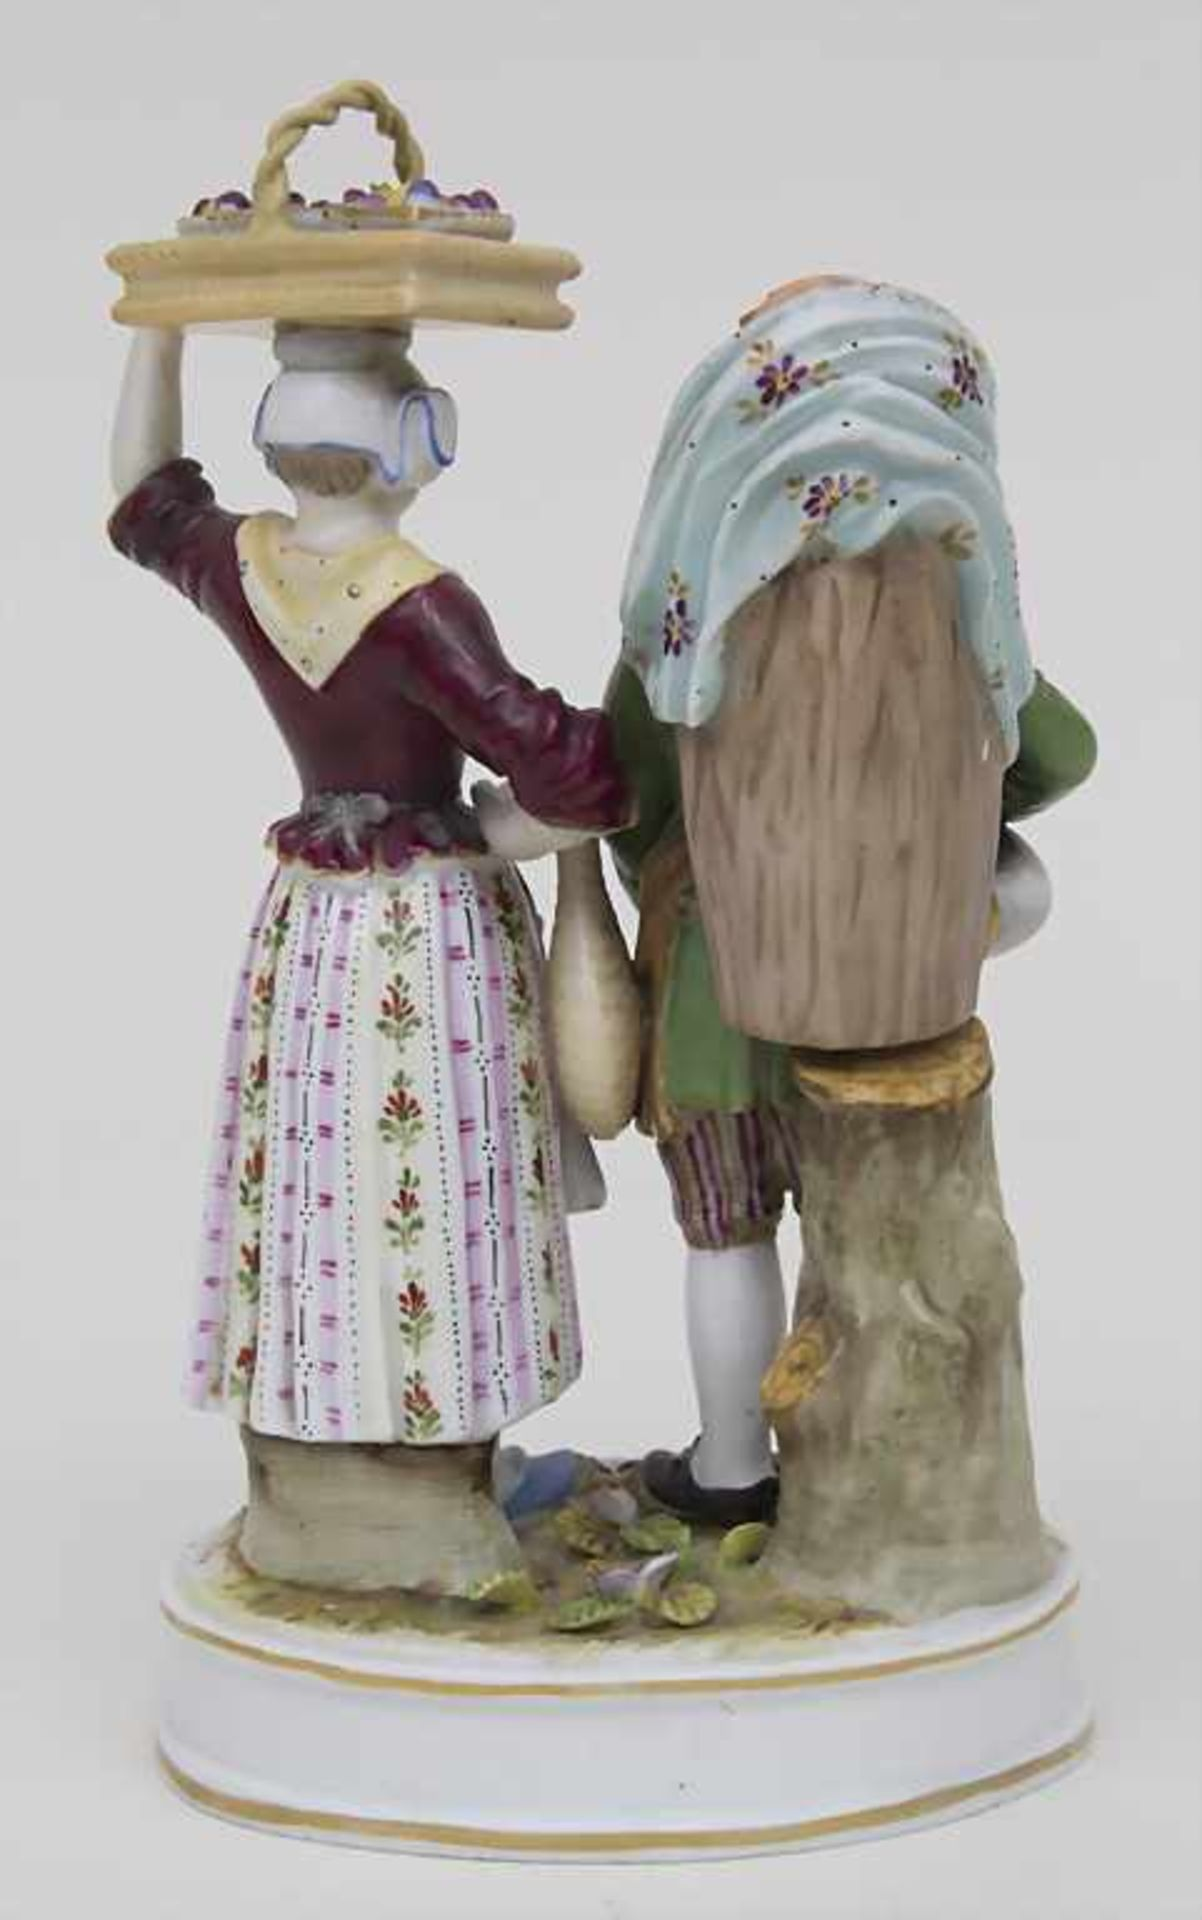 Figurengruppe 'Marktverkäufer' / A figural group 'market sellers', Volkstedt-Rudolstadt, um 1900 - Bild 2 aus 4